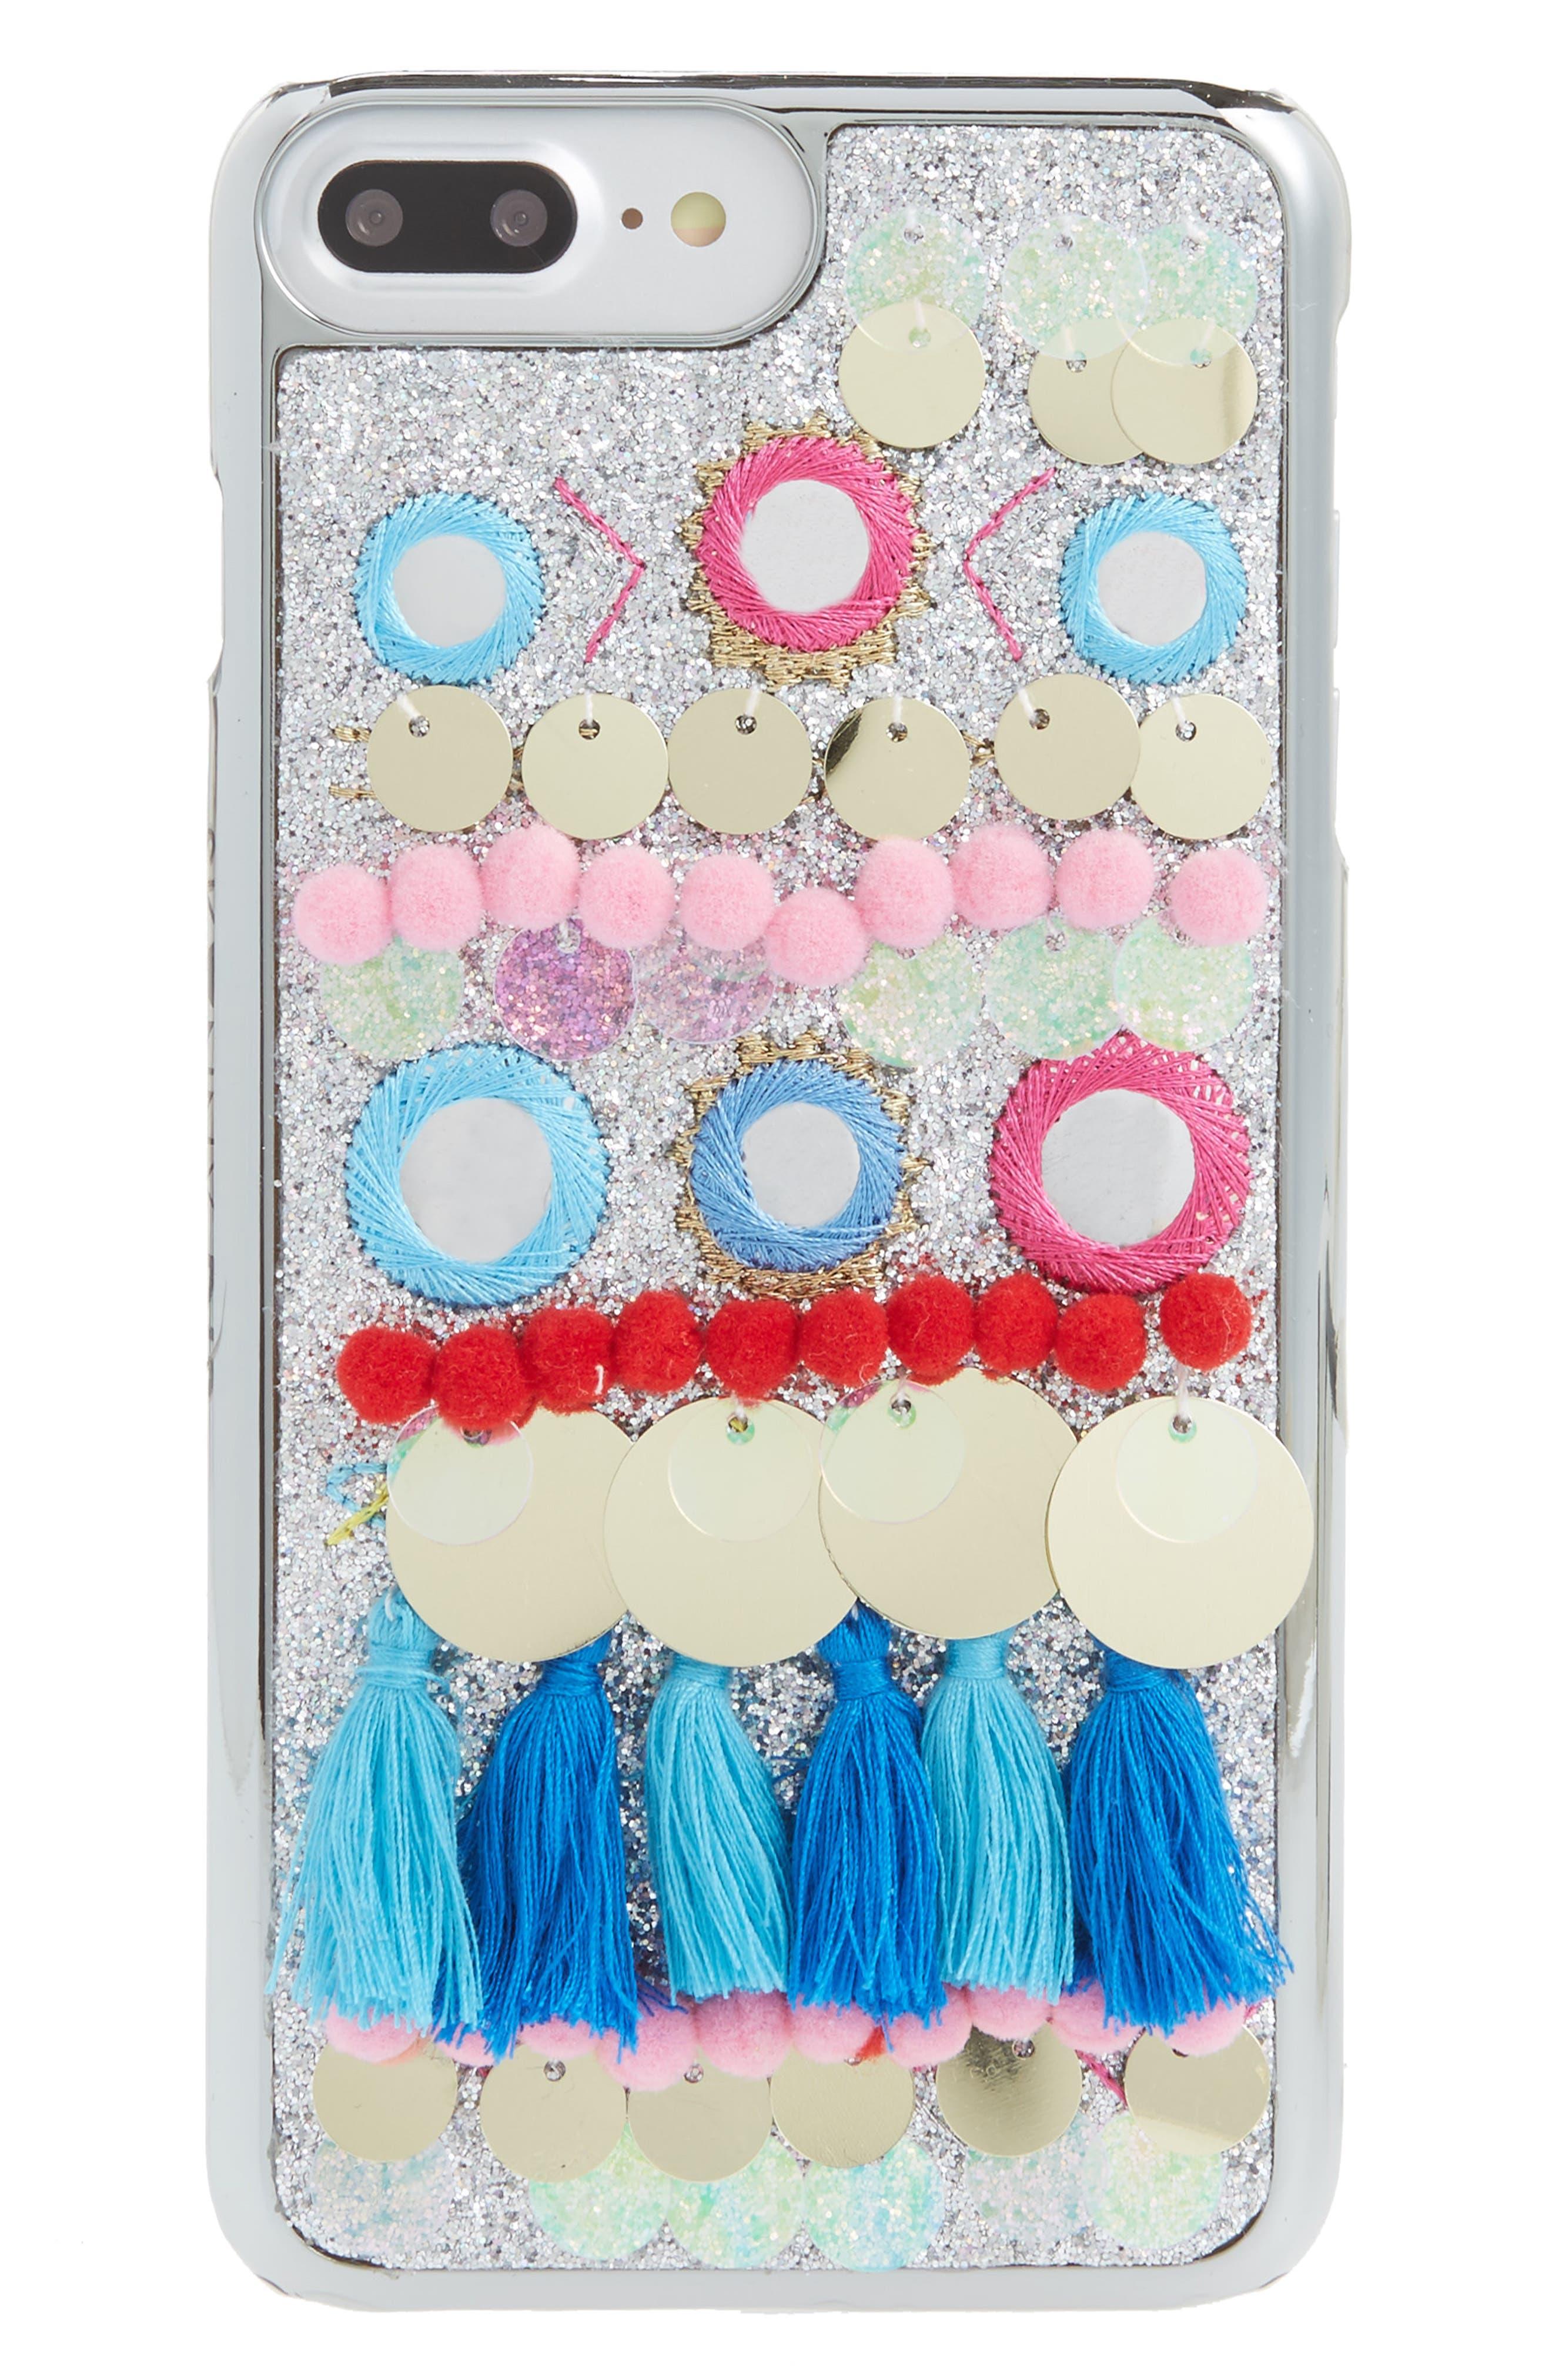 Main Image - Skinnydip Cruz iPhone 6/7 & 6/7 Plus Case